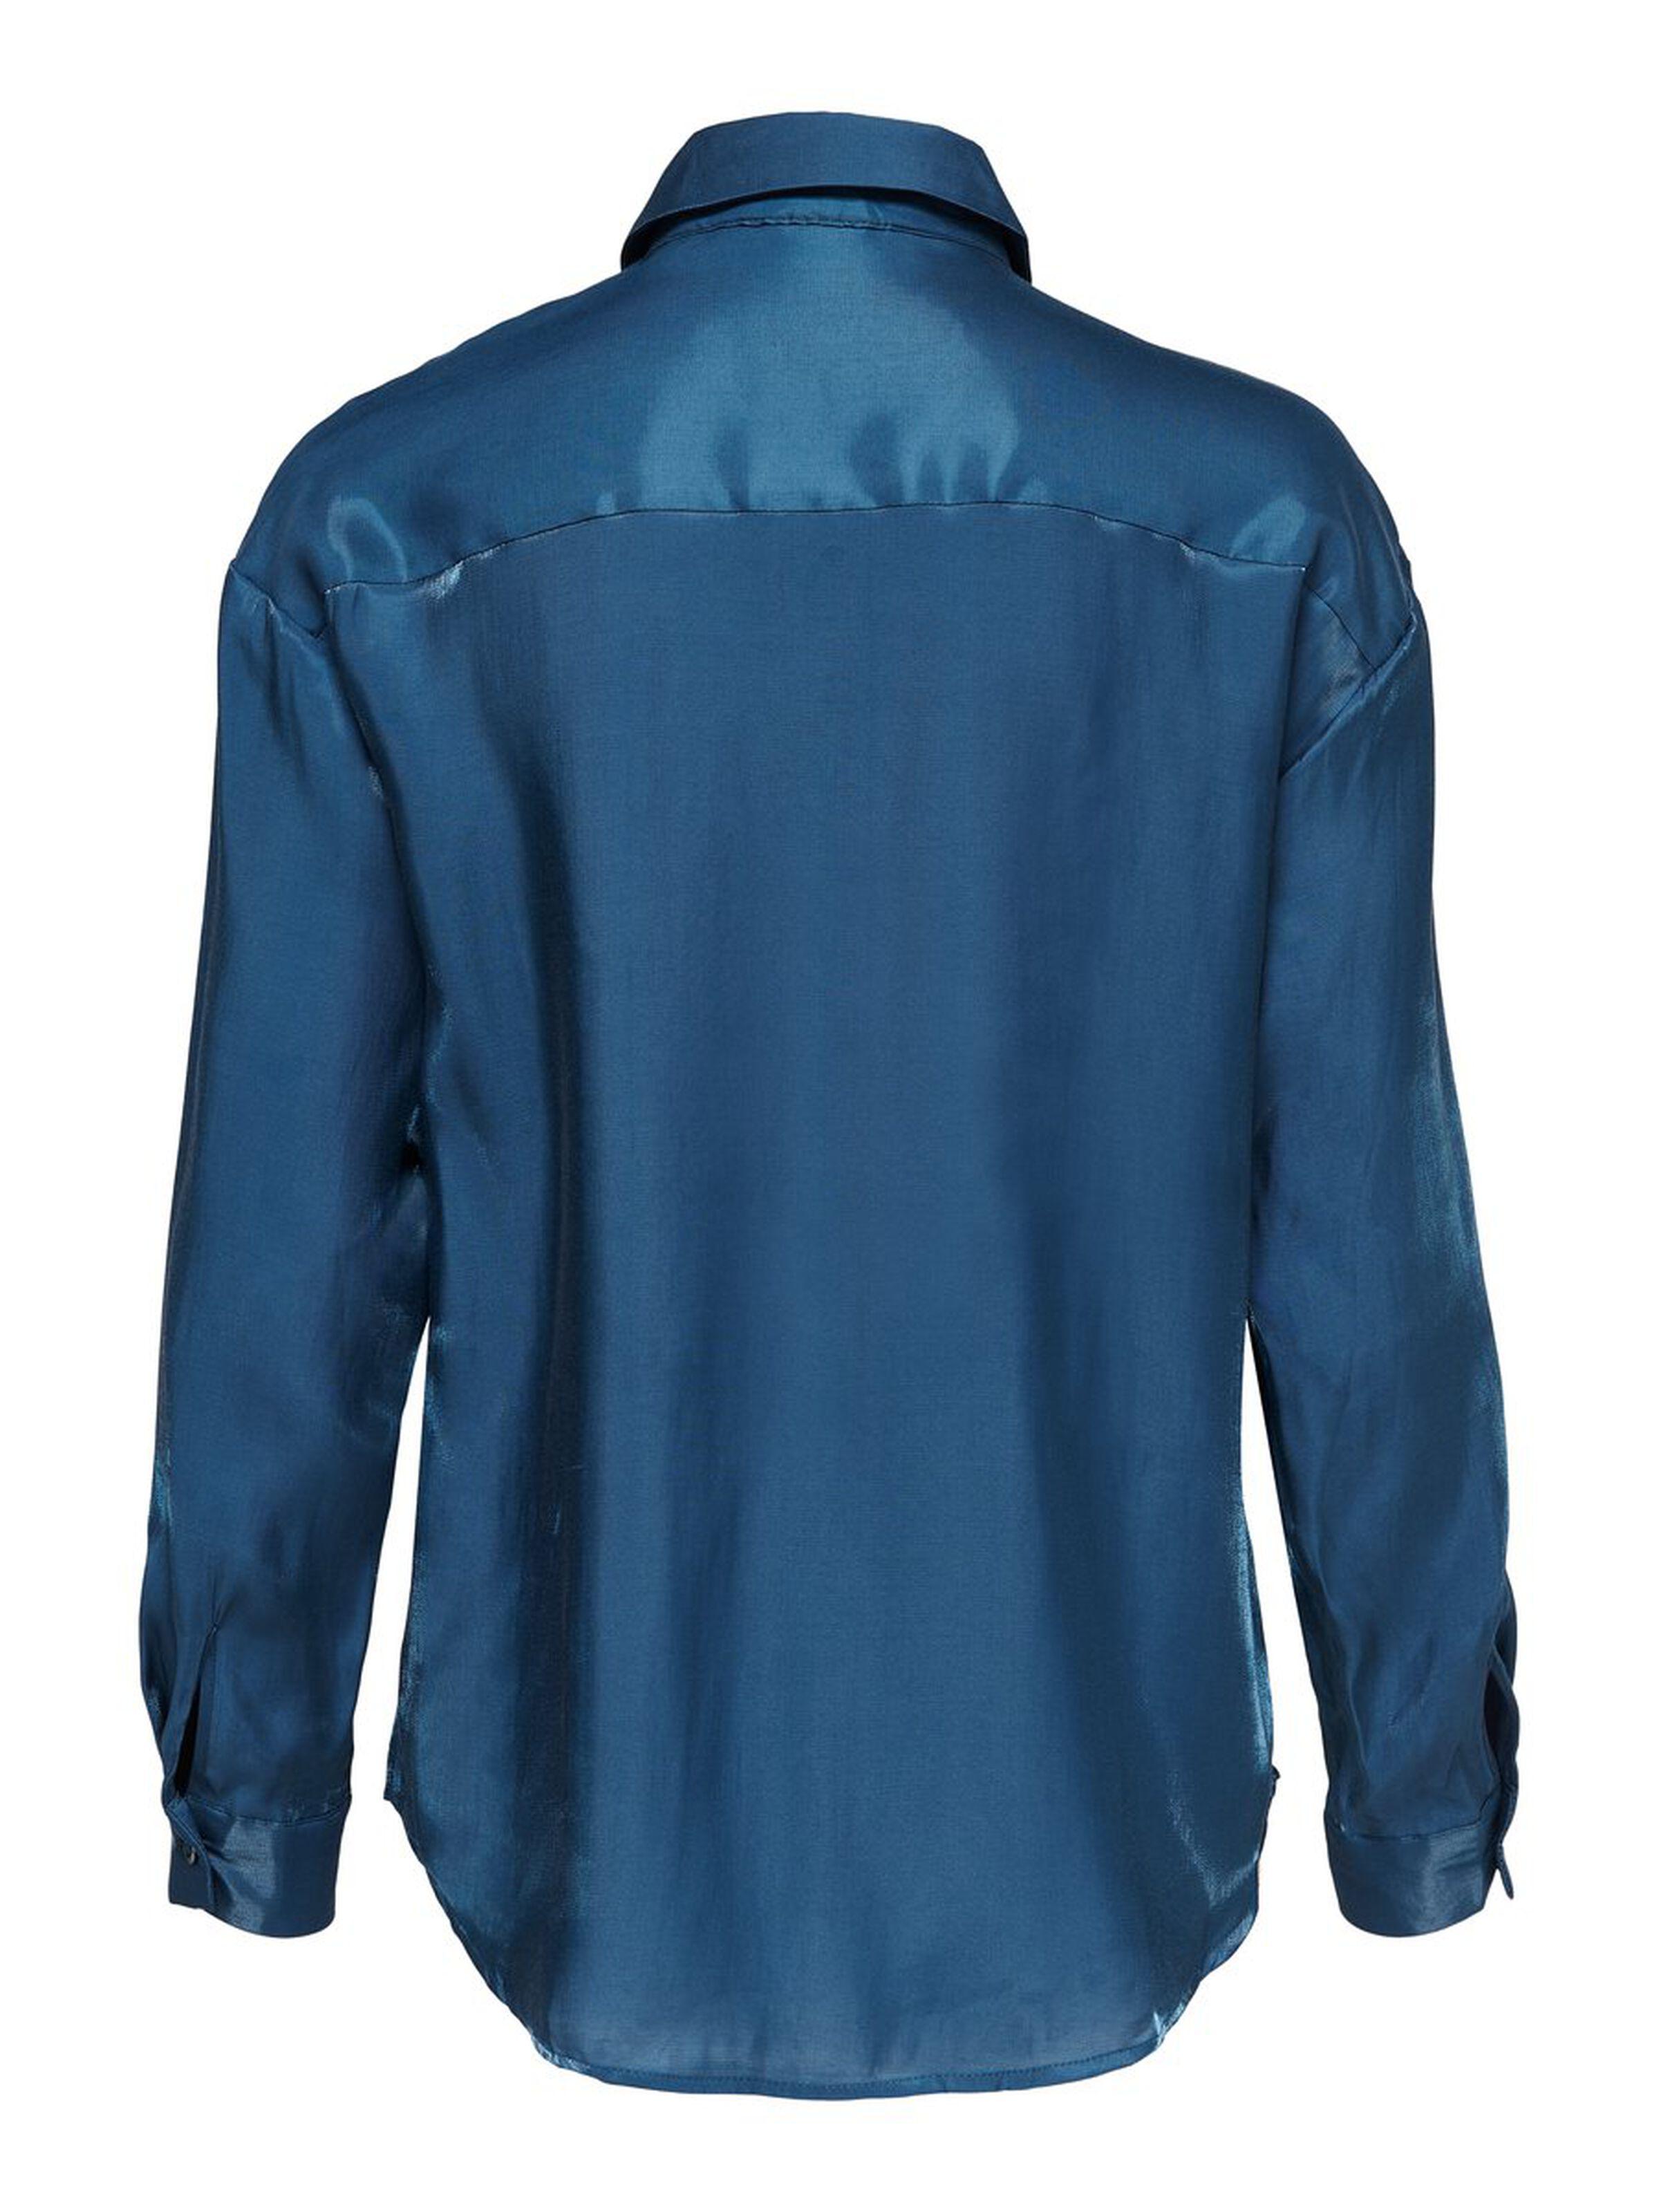 LIVA LS LOOSE SHIRT LOOSE SHIRT WVN ONLY | Shirt | 15197683DARKDENIM